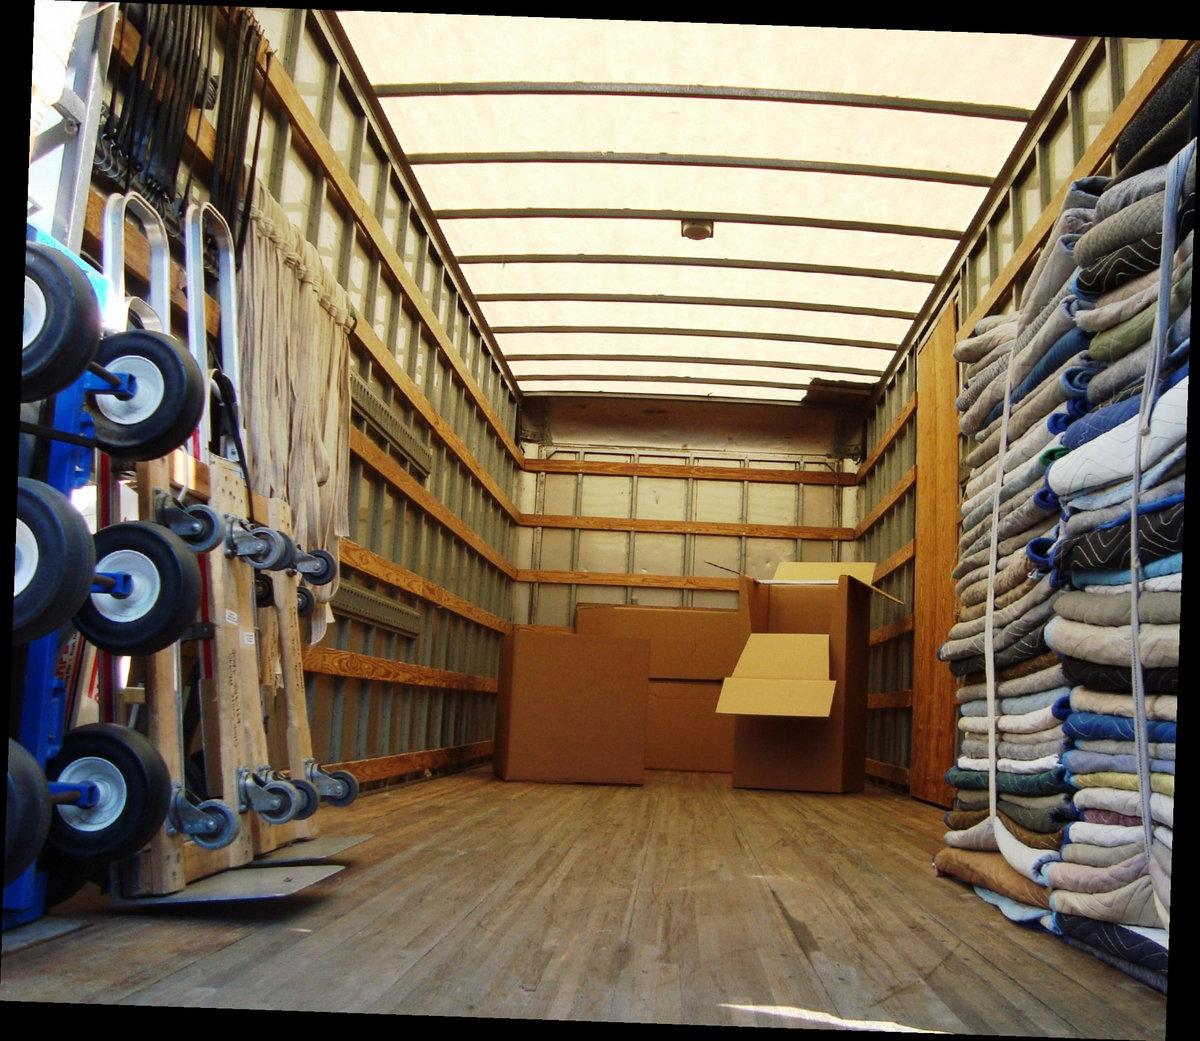 u haul moving boxes review | Vernon Hudson